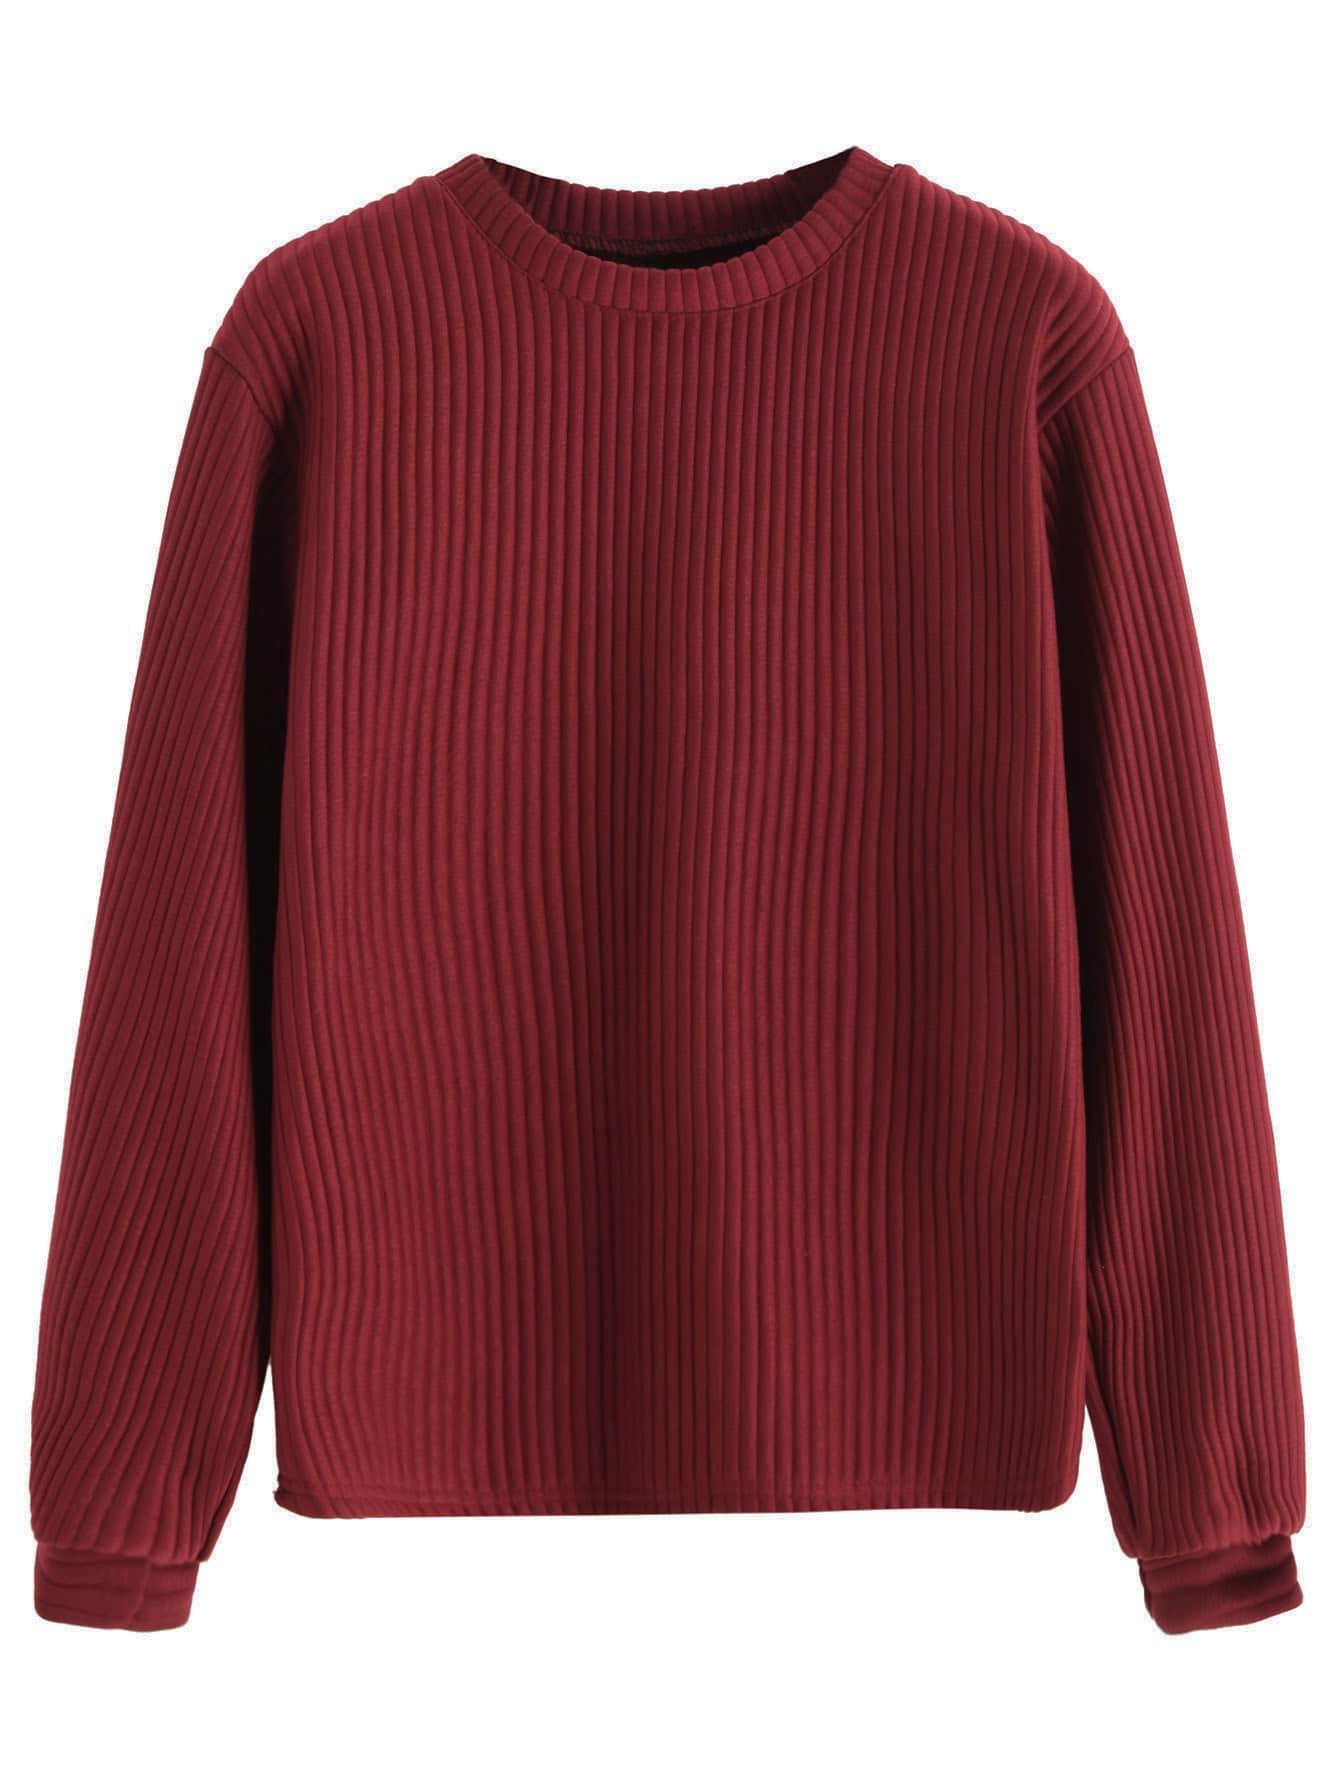 Ribbed Drop Shoulder Sweatshirt sweatshirt160908104